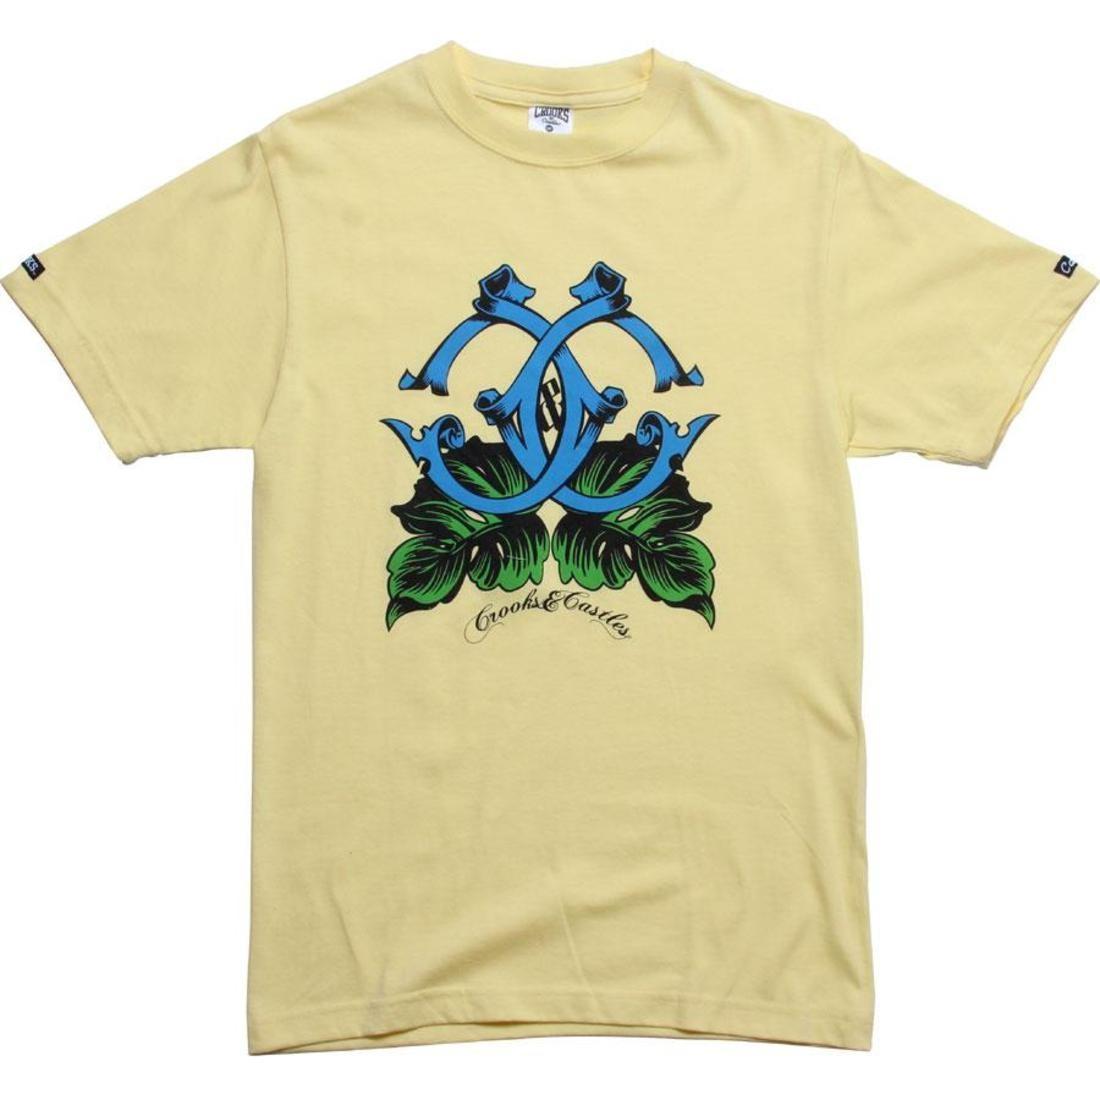 Tシャツ 【 CROOKS AND CASTLES ISLAND CS TEE CANARY 】 メンズファッション トップス Tシャツ カットソー